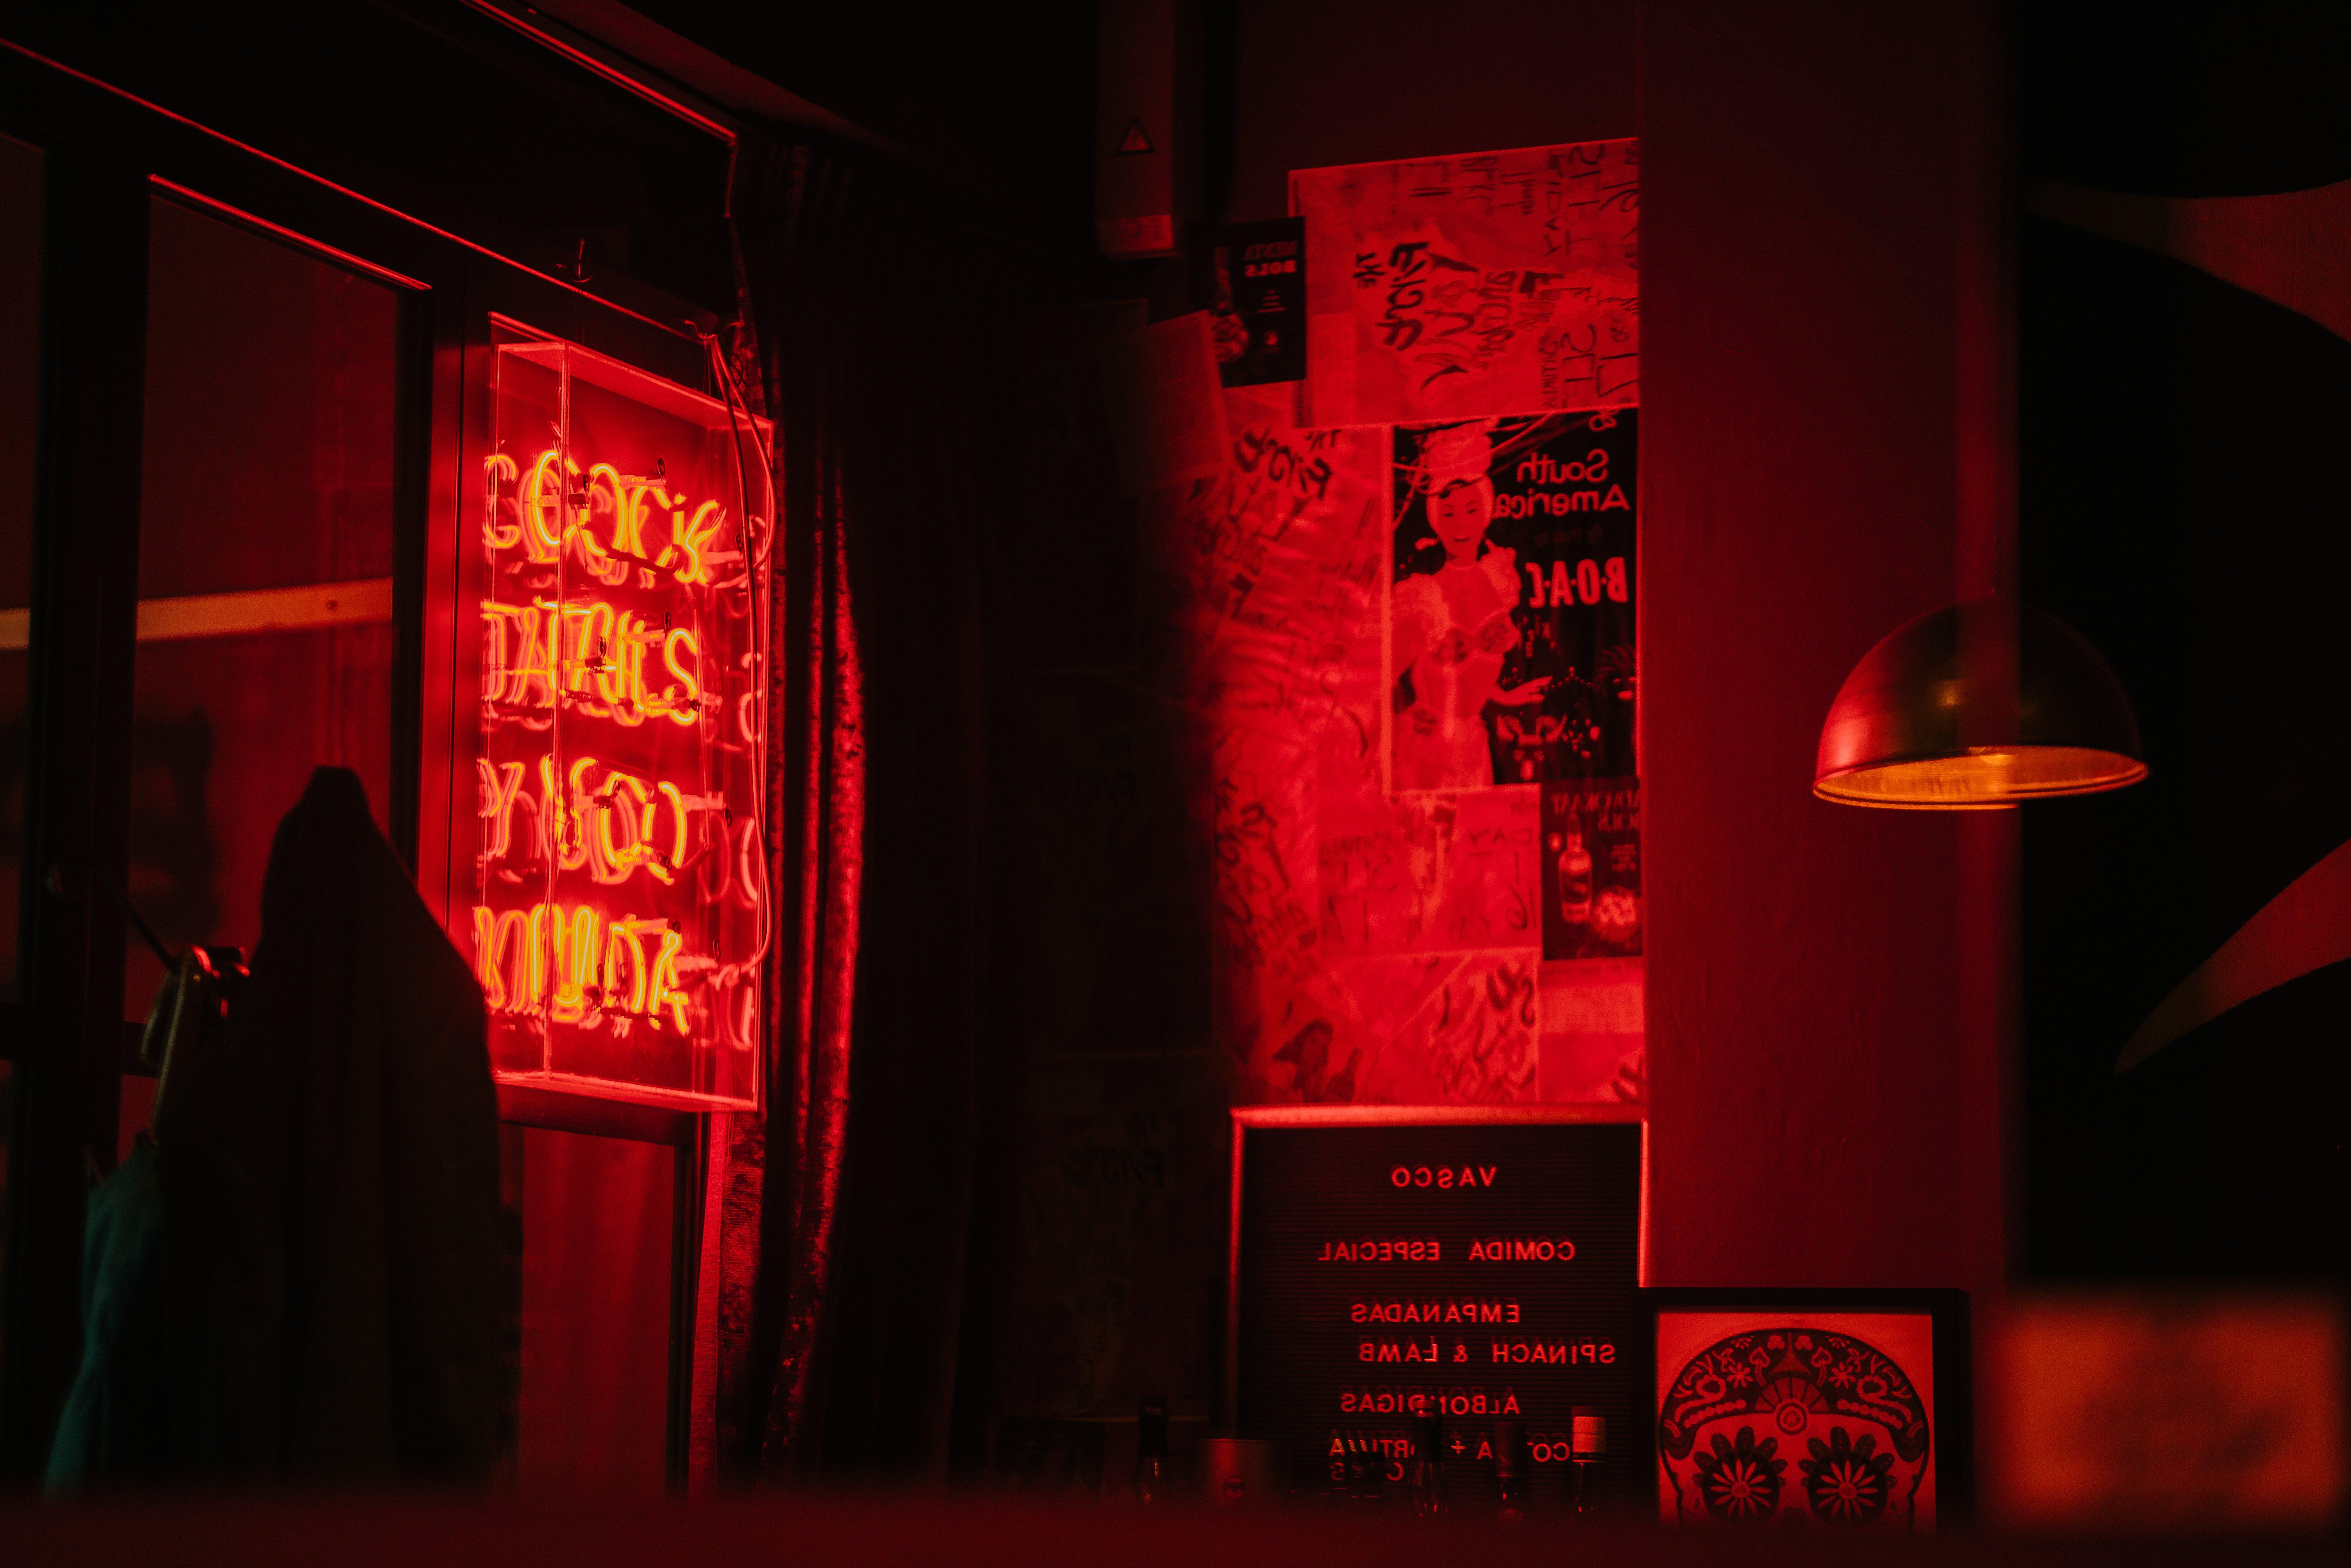 Kostenloses Stock Foto zu bar, beleuchtet, drinnen, dunkel